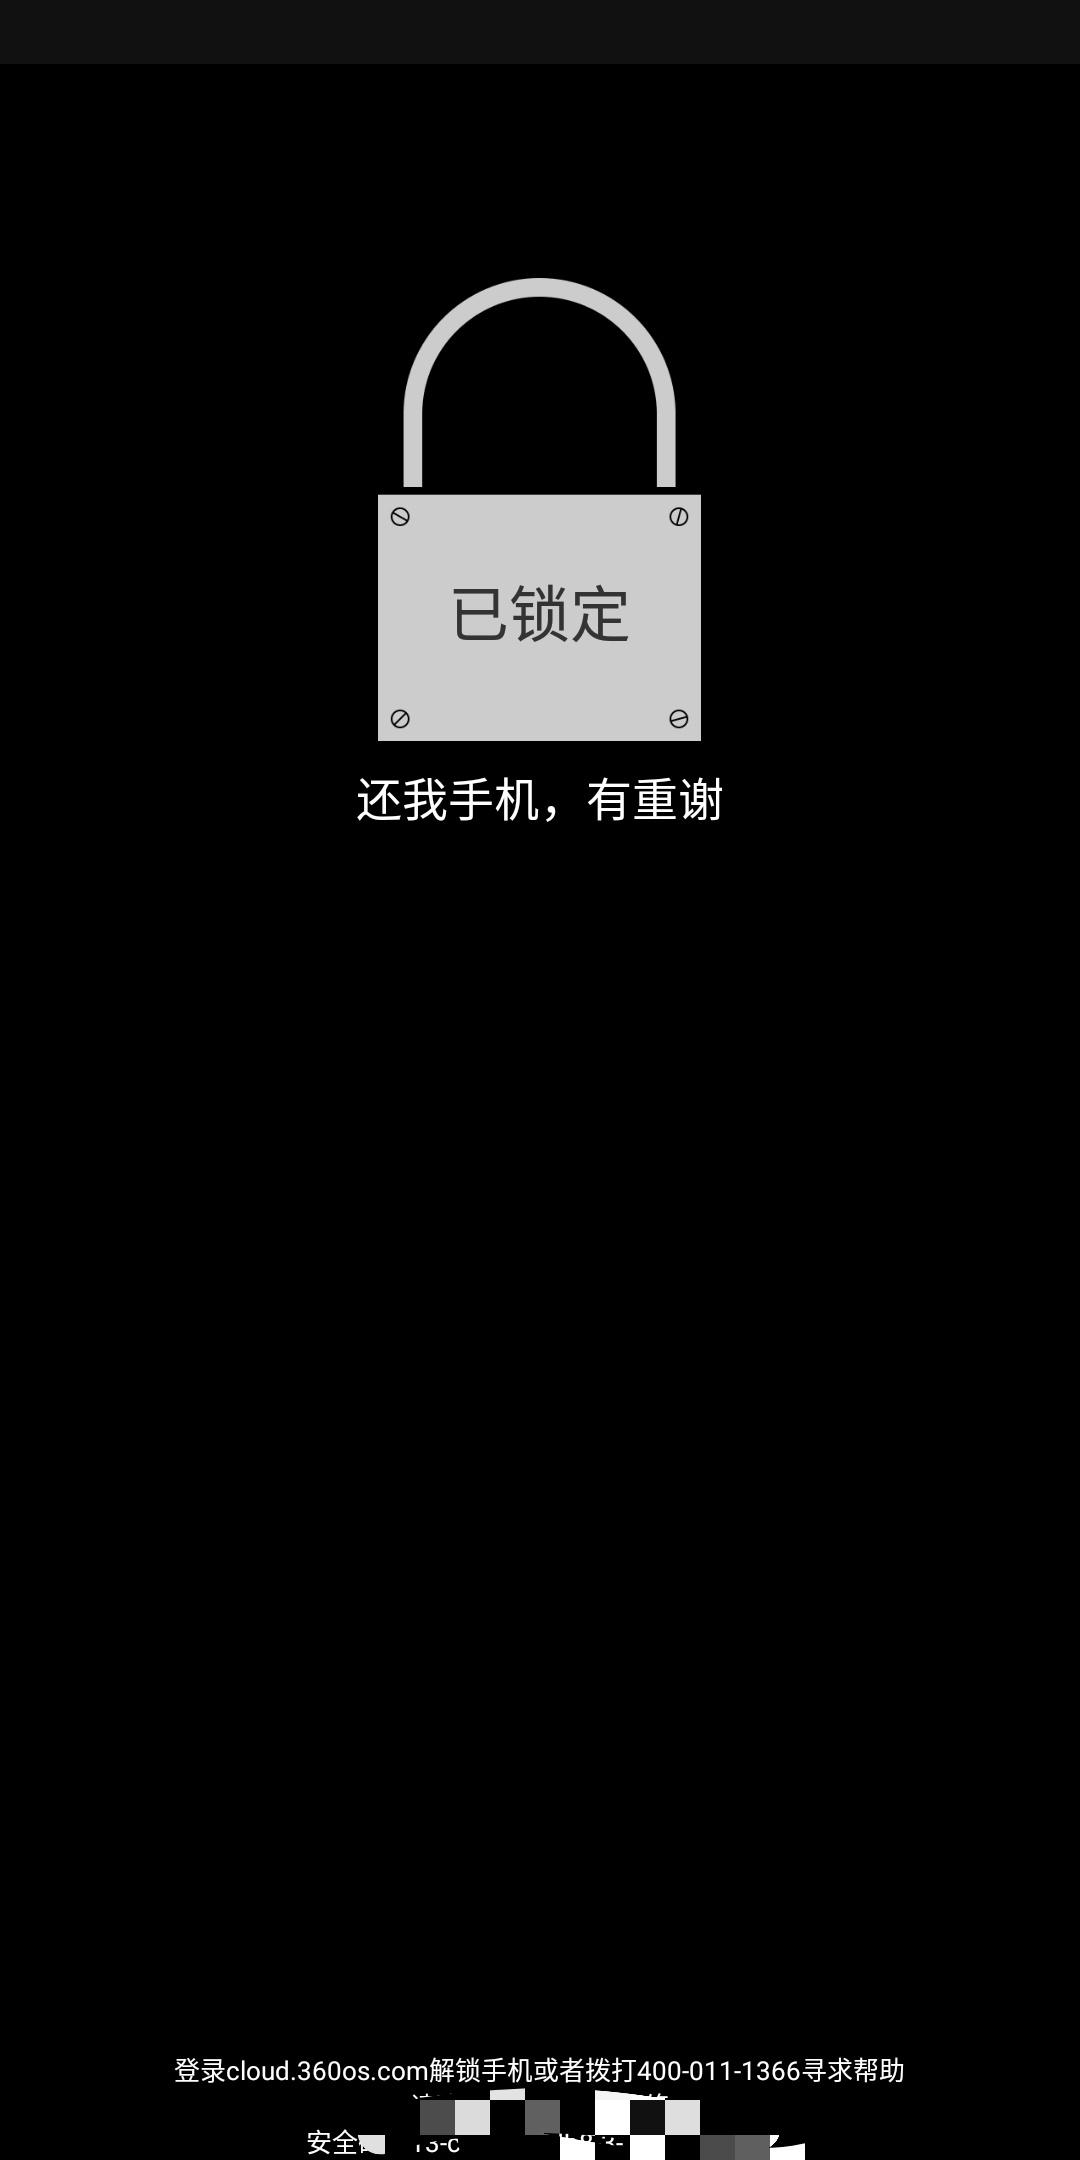 IMG_20181219_202249.jpg